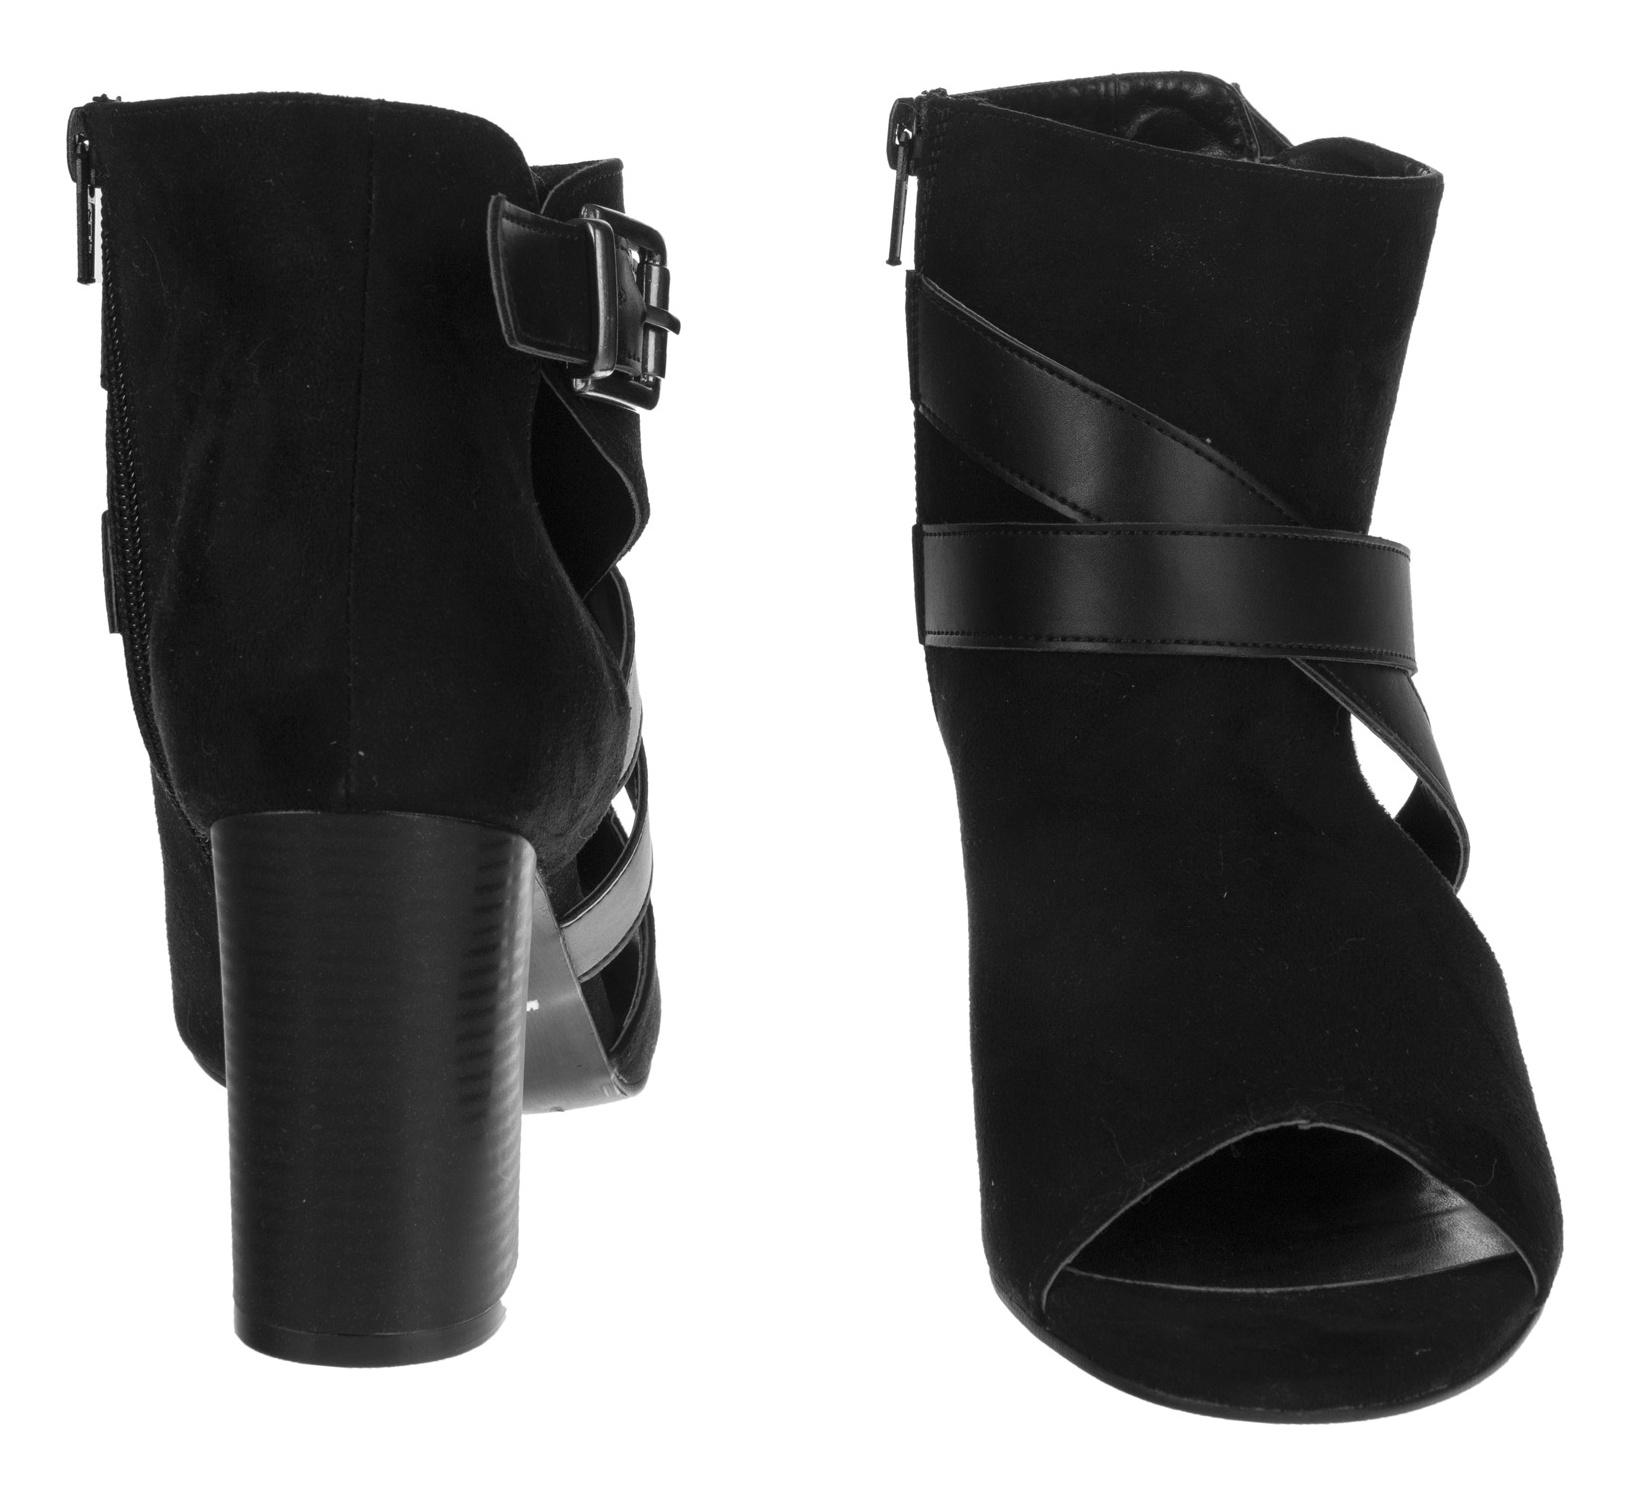 کفش زنانه بوتیگو مدل 100316174-101 main 1 4